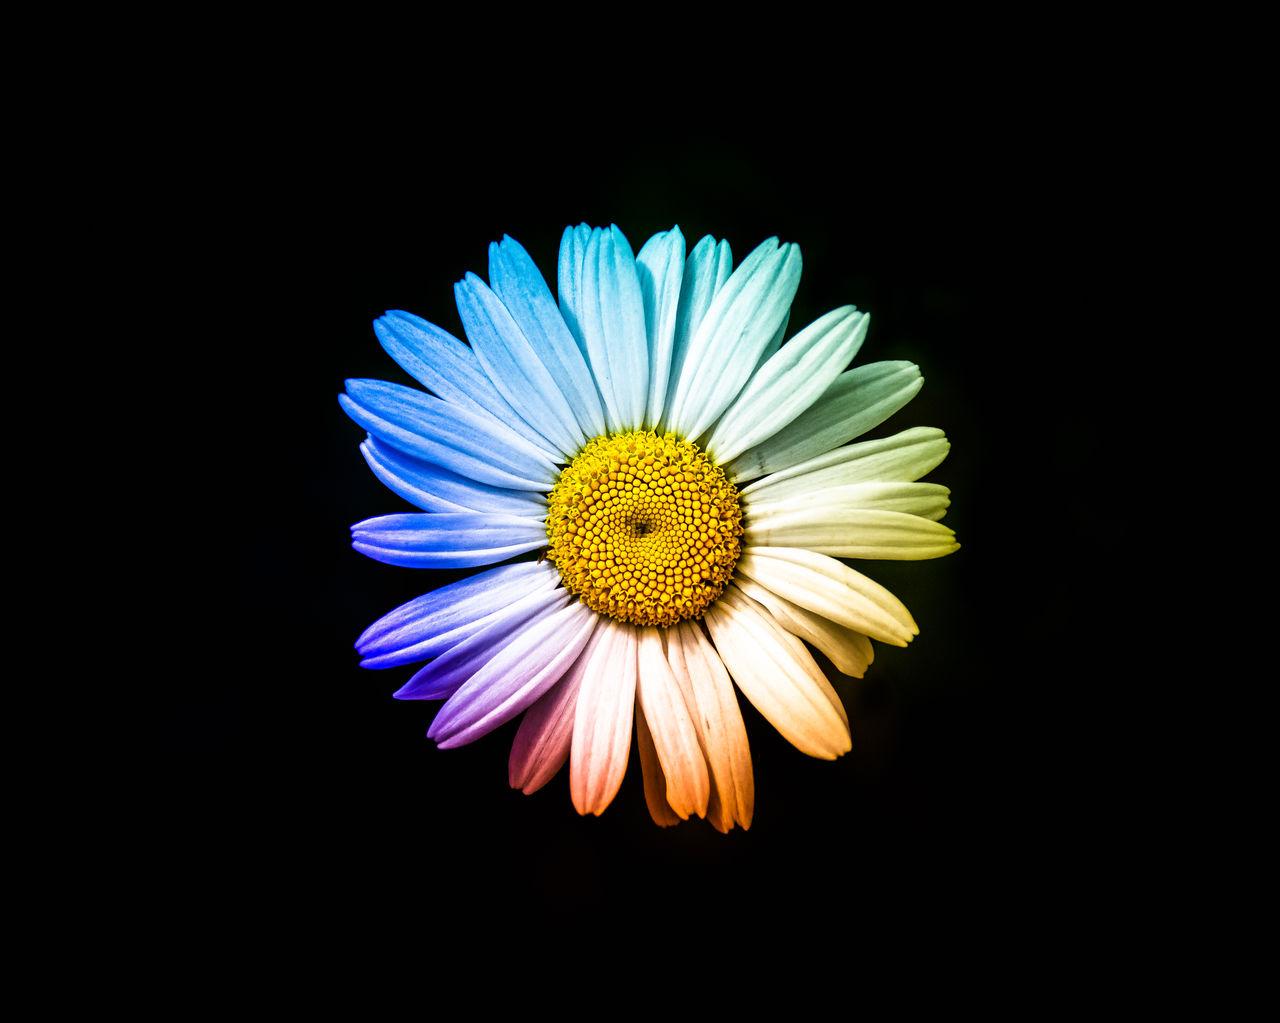 CLOSE UP OF PURPLE FLOWER